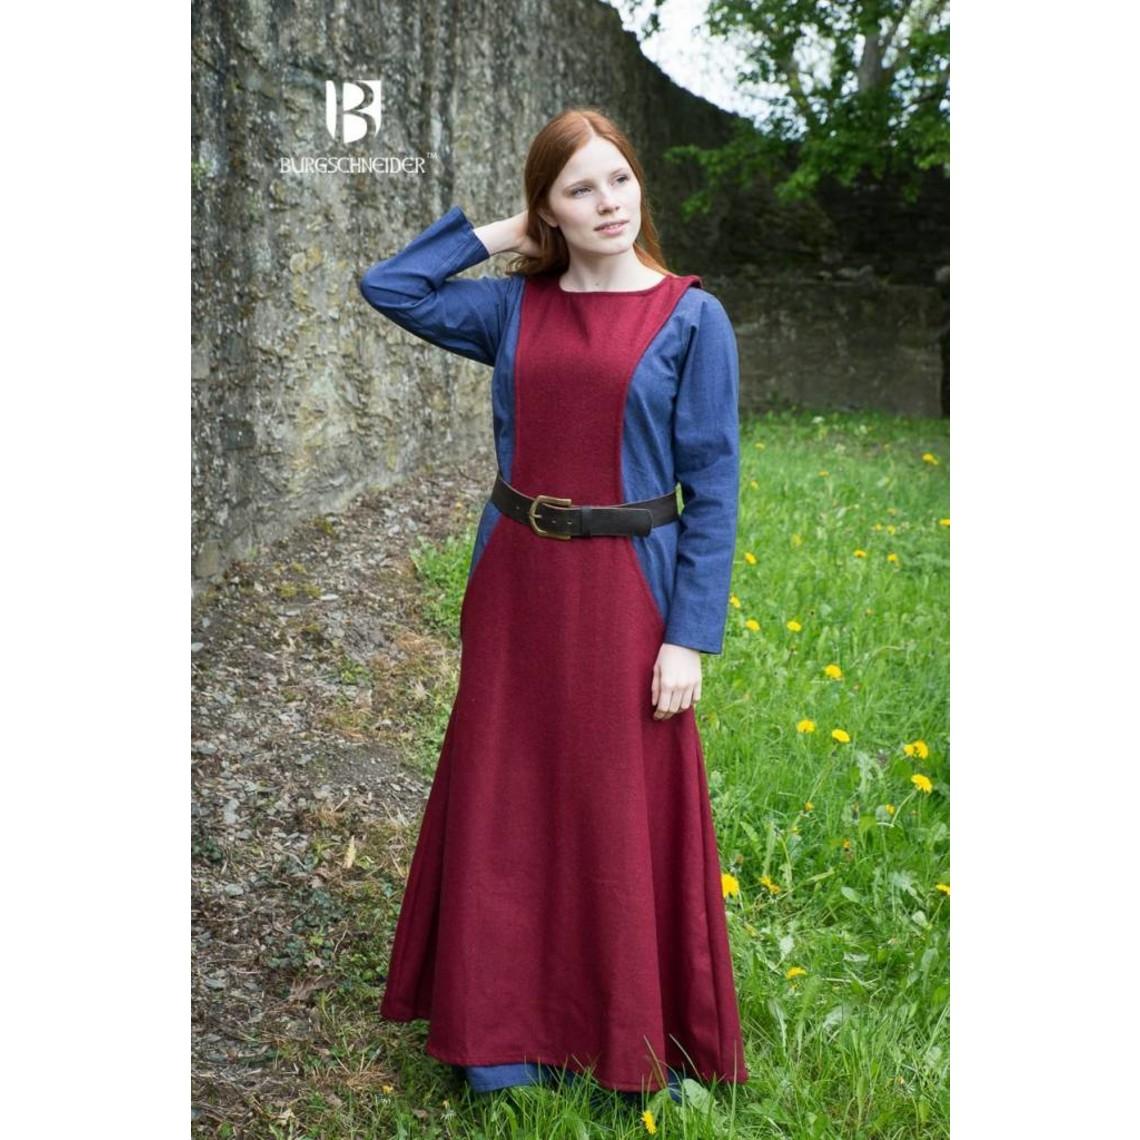 Burgschneider Surcoat Albrun rød